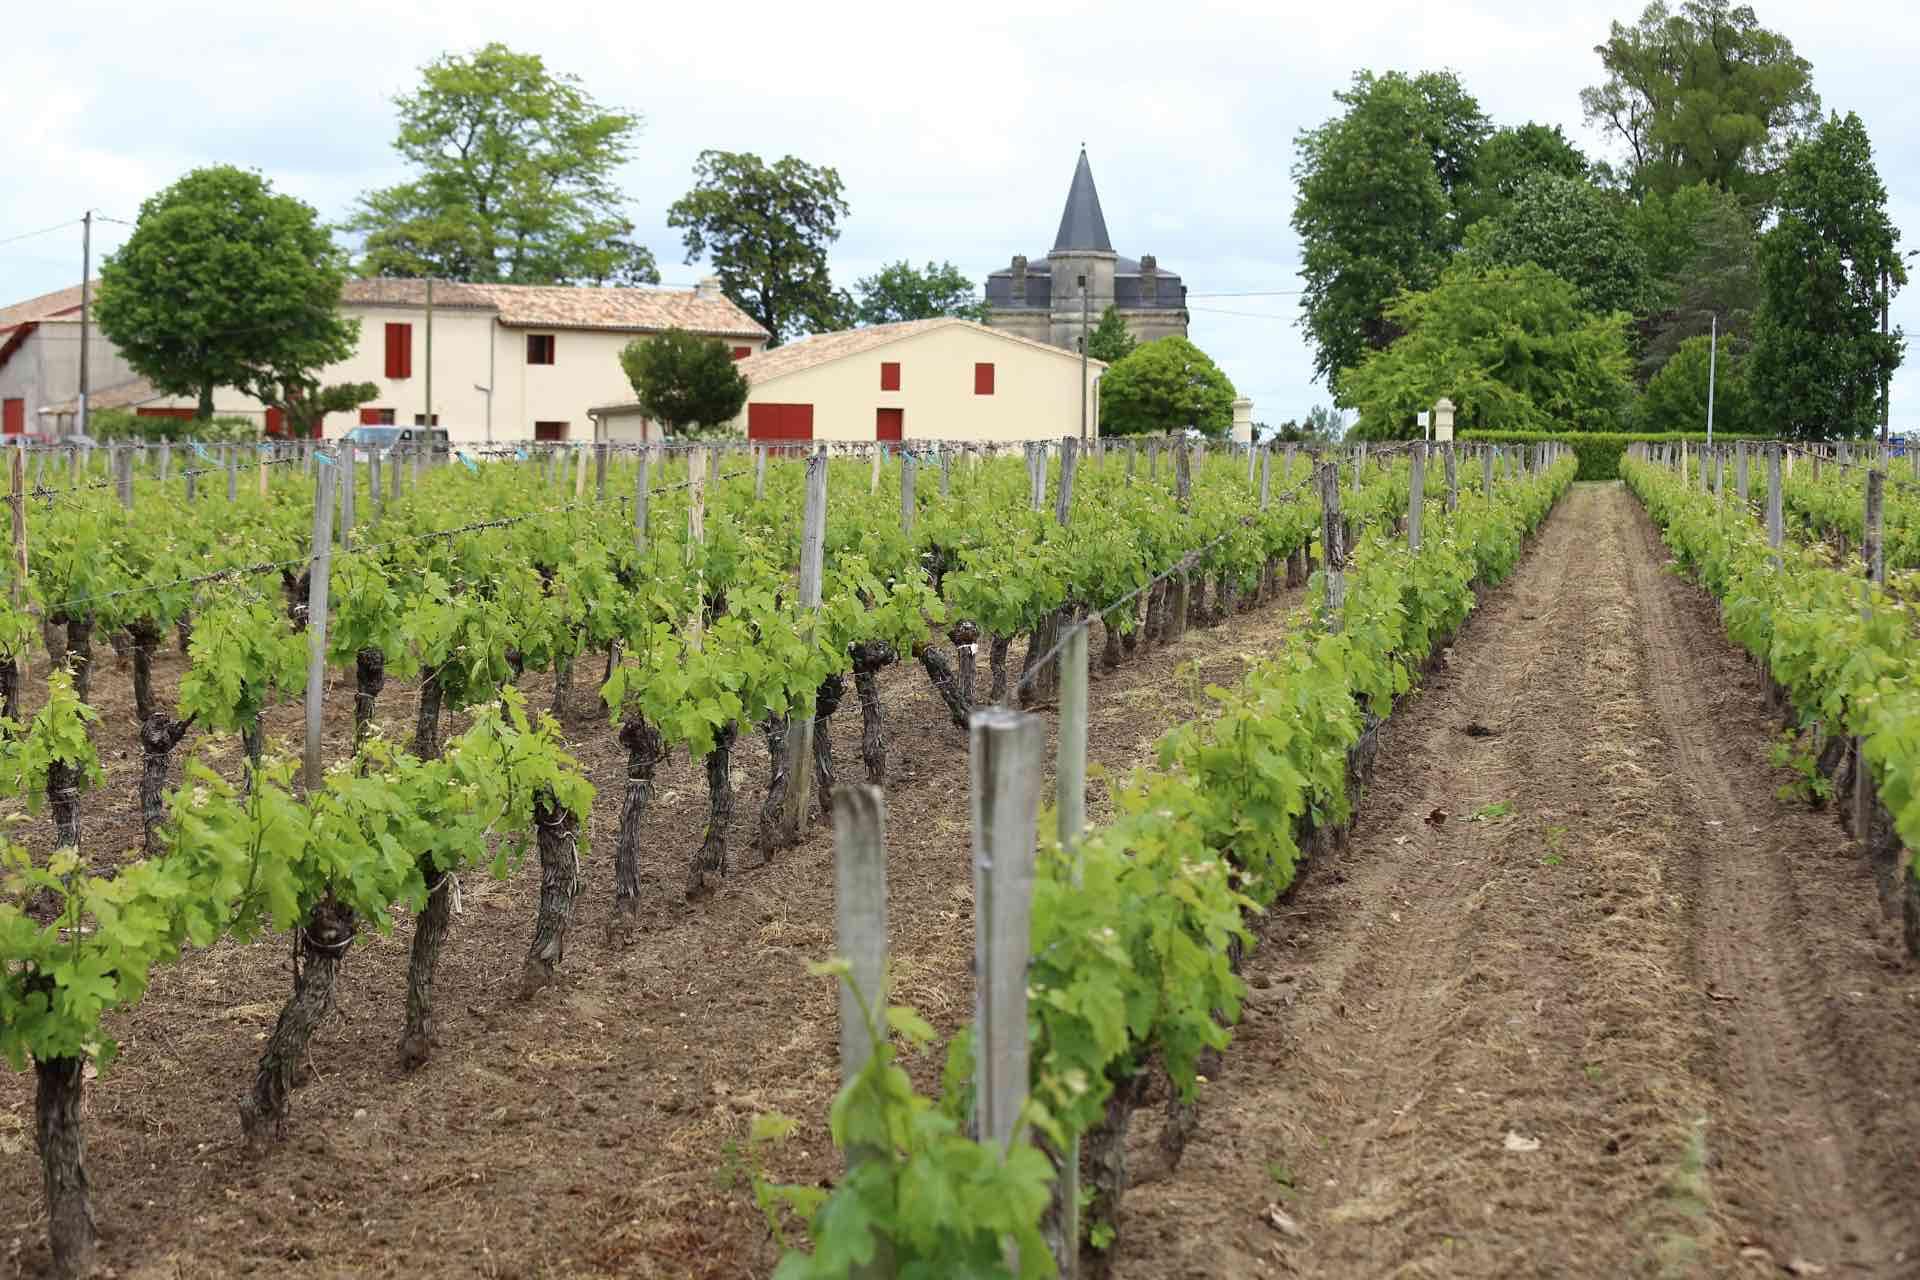 Château Yon Figeac - アペロ ワインバー オーガニックワインxフランス家庭料理 - 東京都港区南青山3-4-6 / apéro WINEBAR - vins et petits plats français